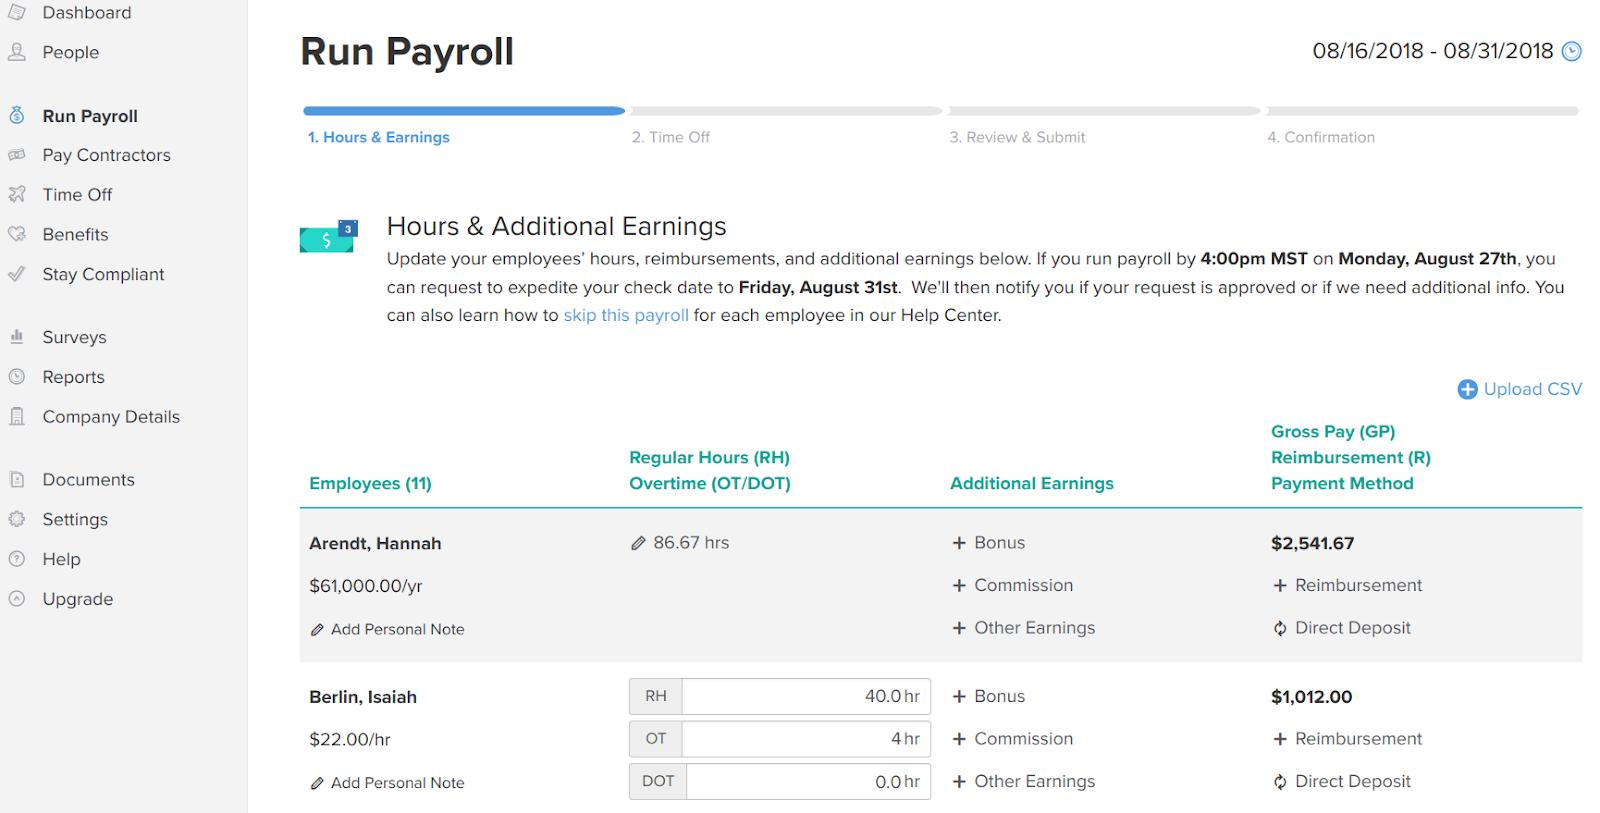 run payroll page